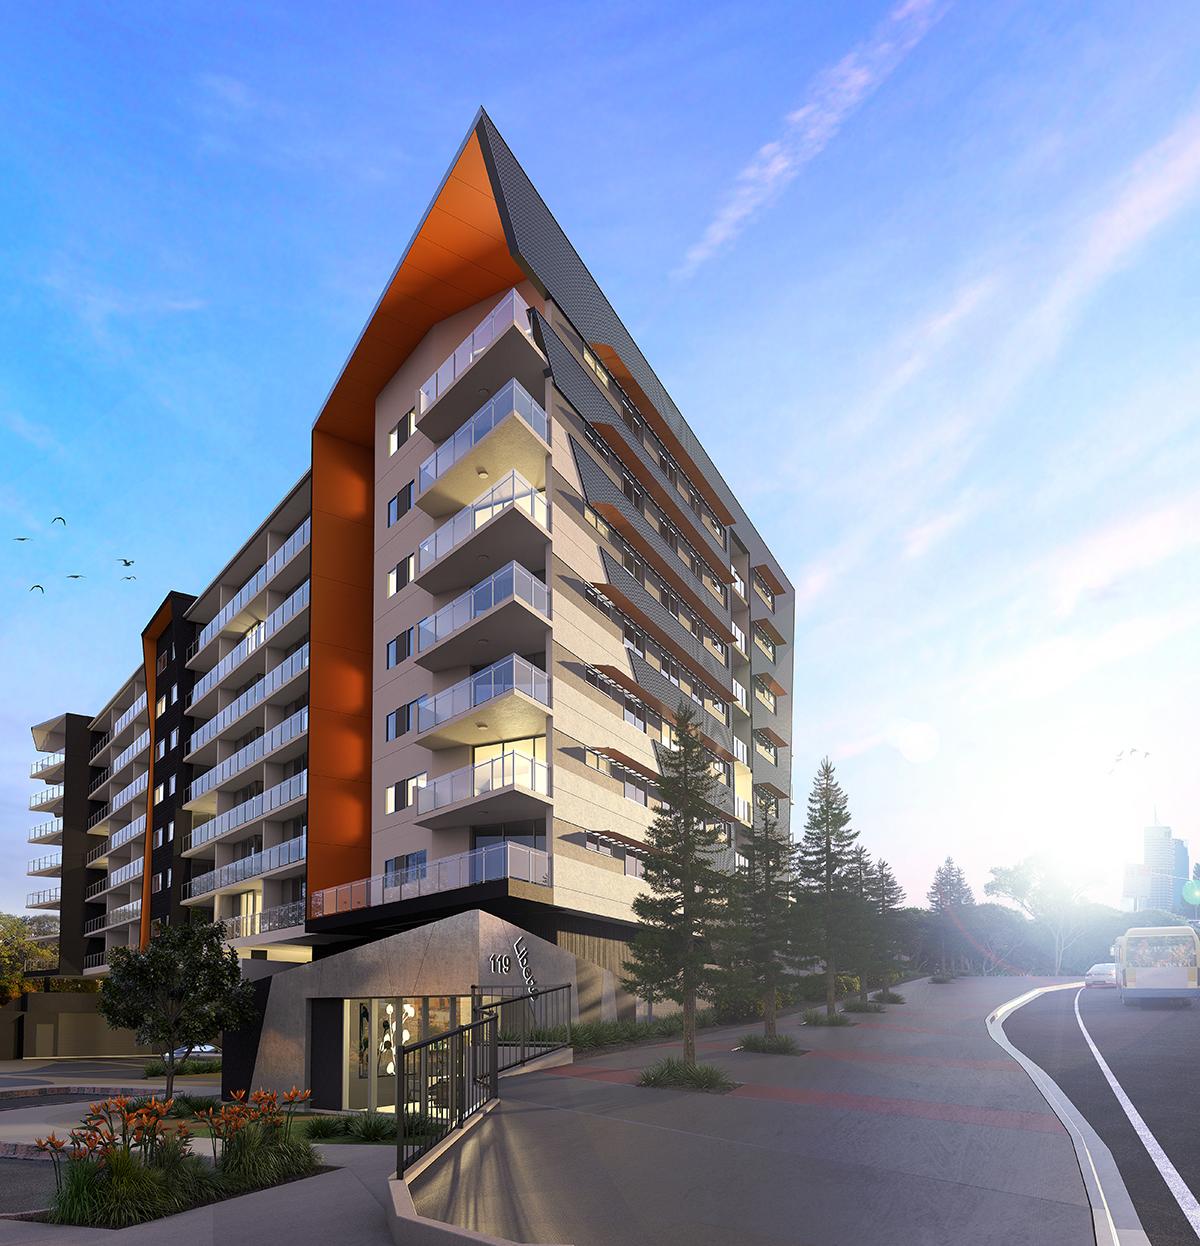 Liberte Residential Property Kangaroo Point CBRE Pradella